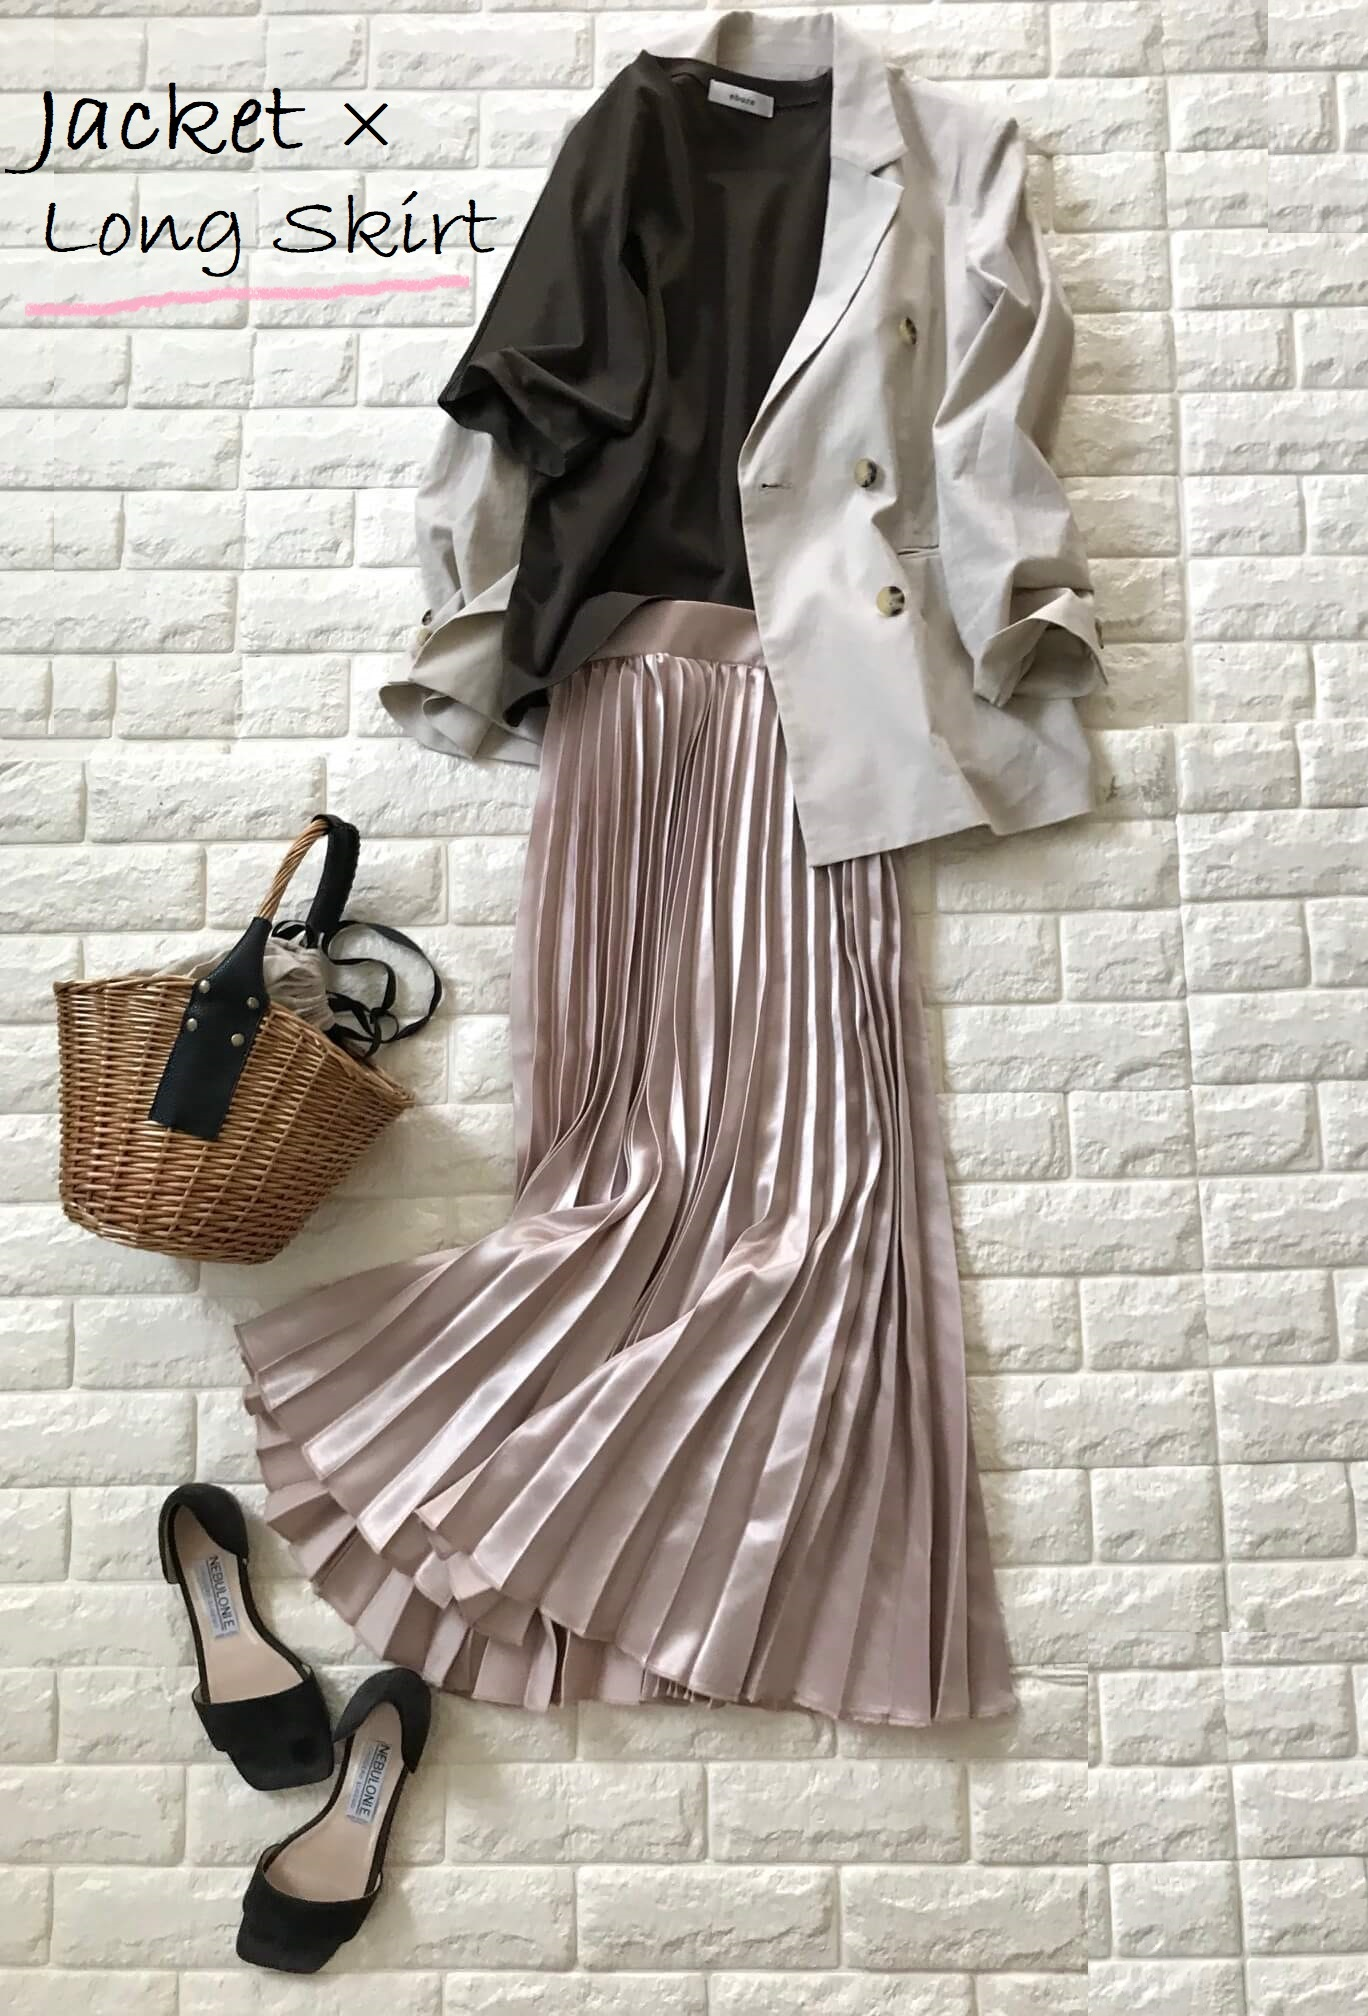 AG by aquagirlジャケットとプリーツスカートを合わせたコーデ